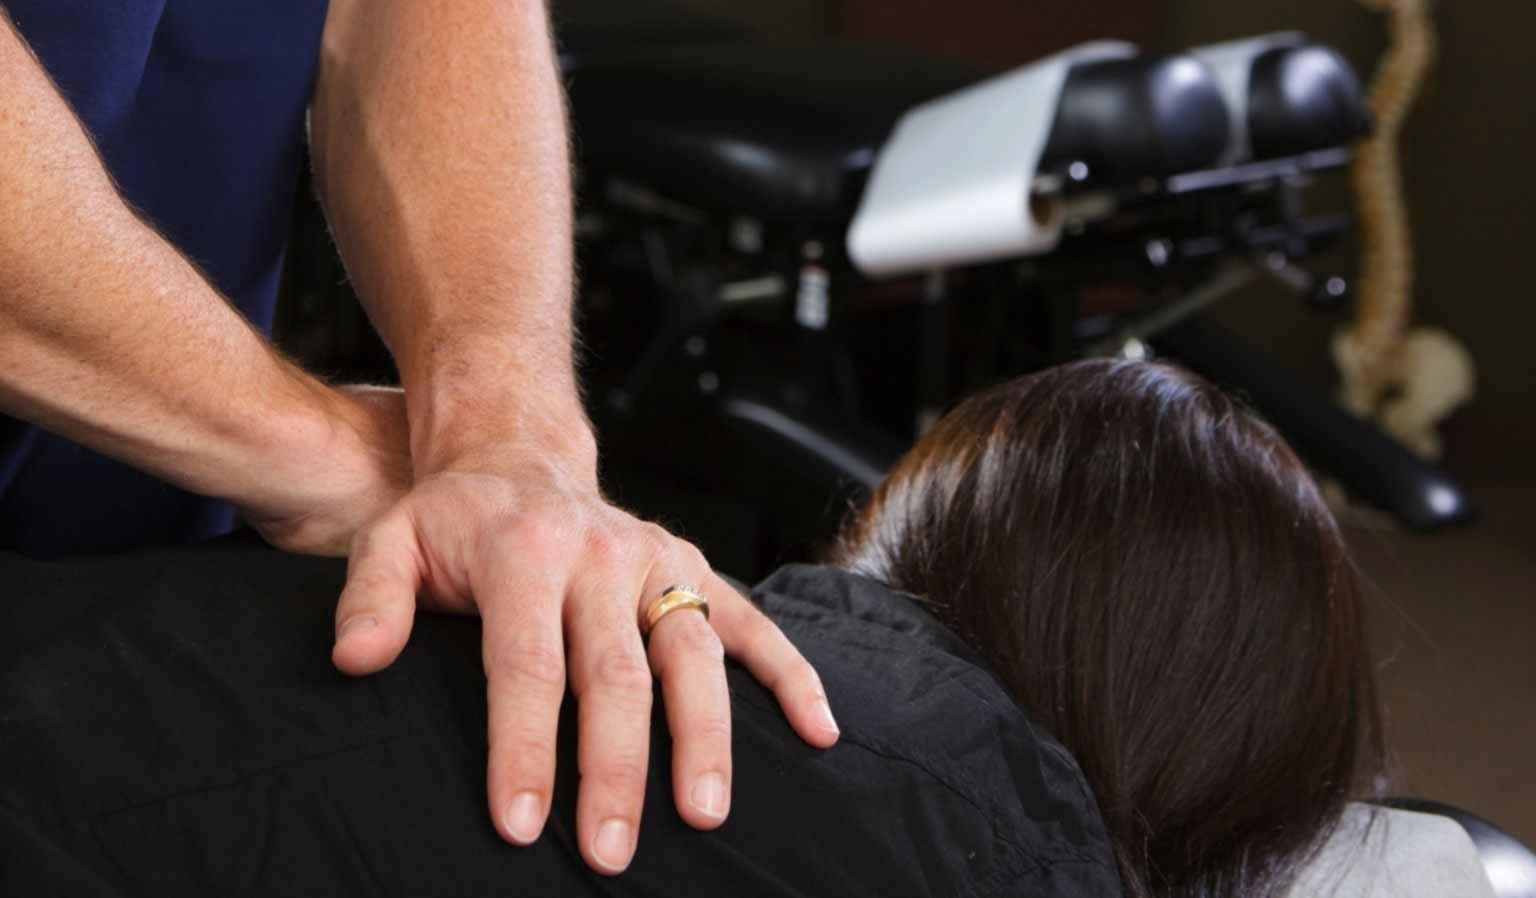 Gonstead Chiropractic Care